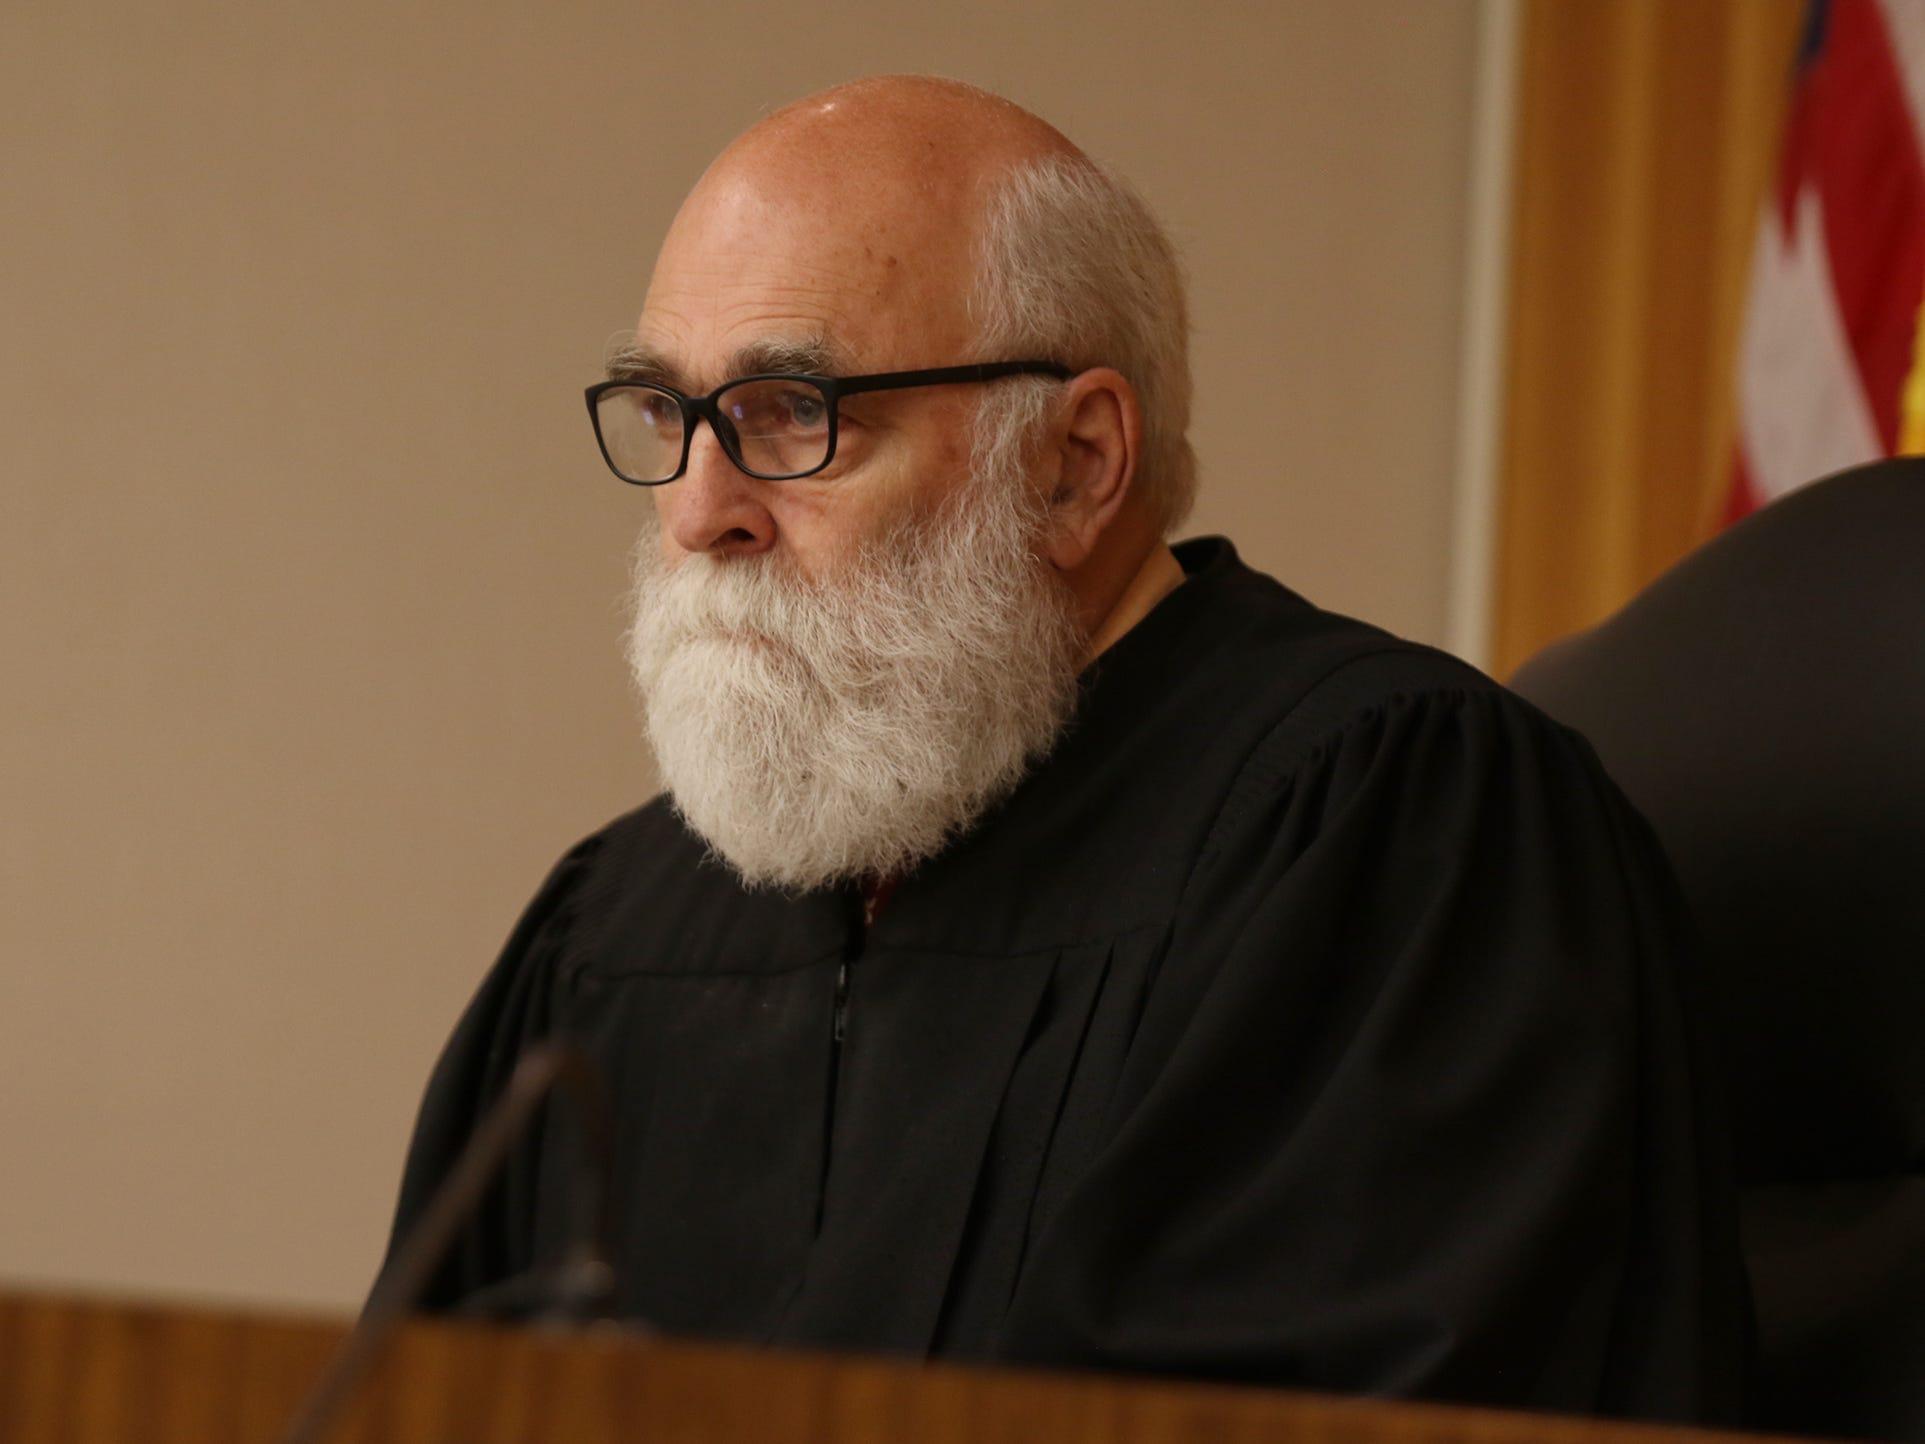 Judge Thomas Rainbow Morse is presiding over the case.